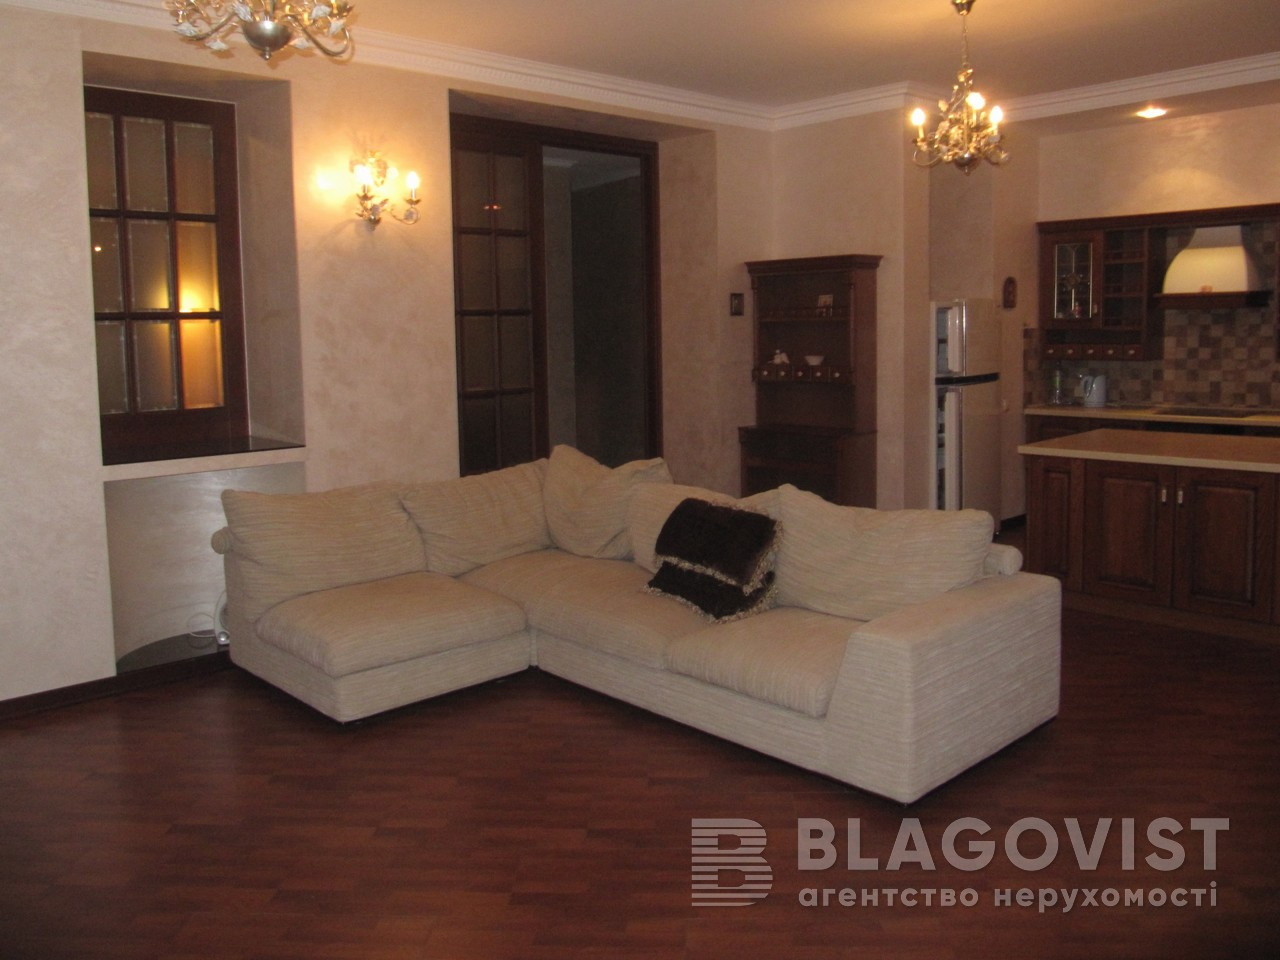 Квартира R-1852, Кловский спуск, 5, Киев - Фото 5